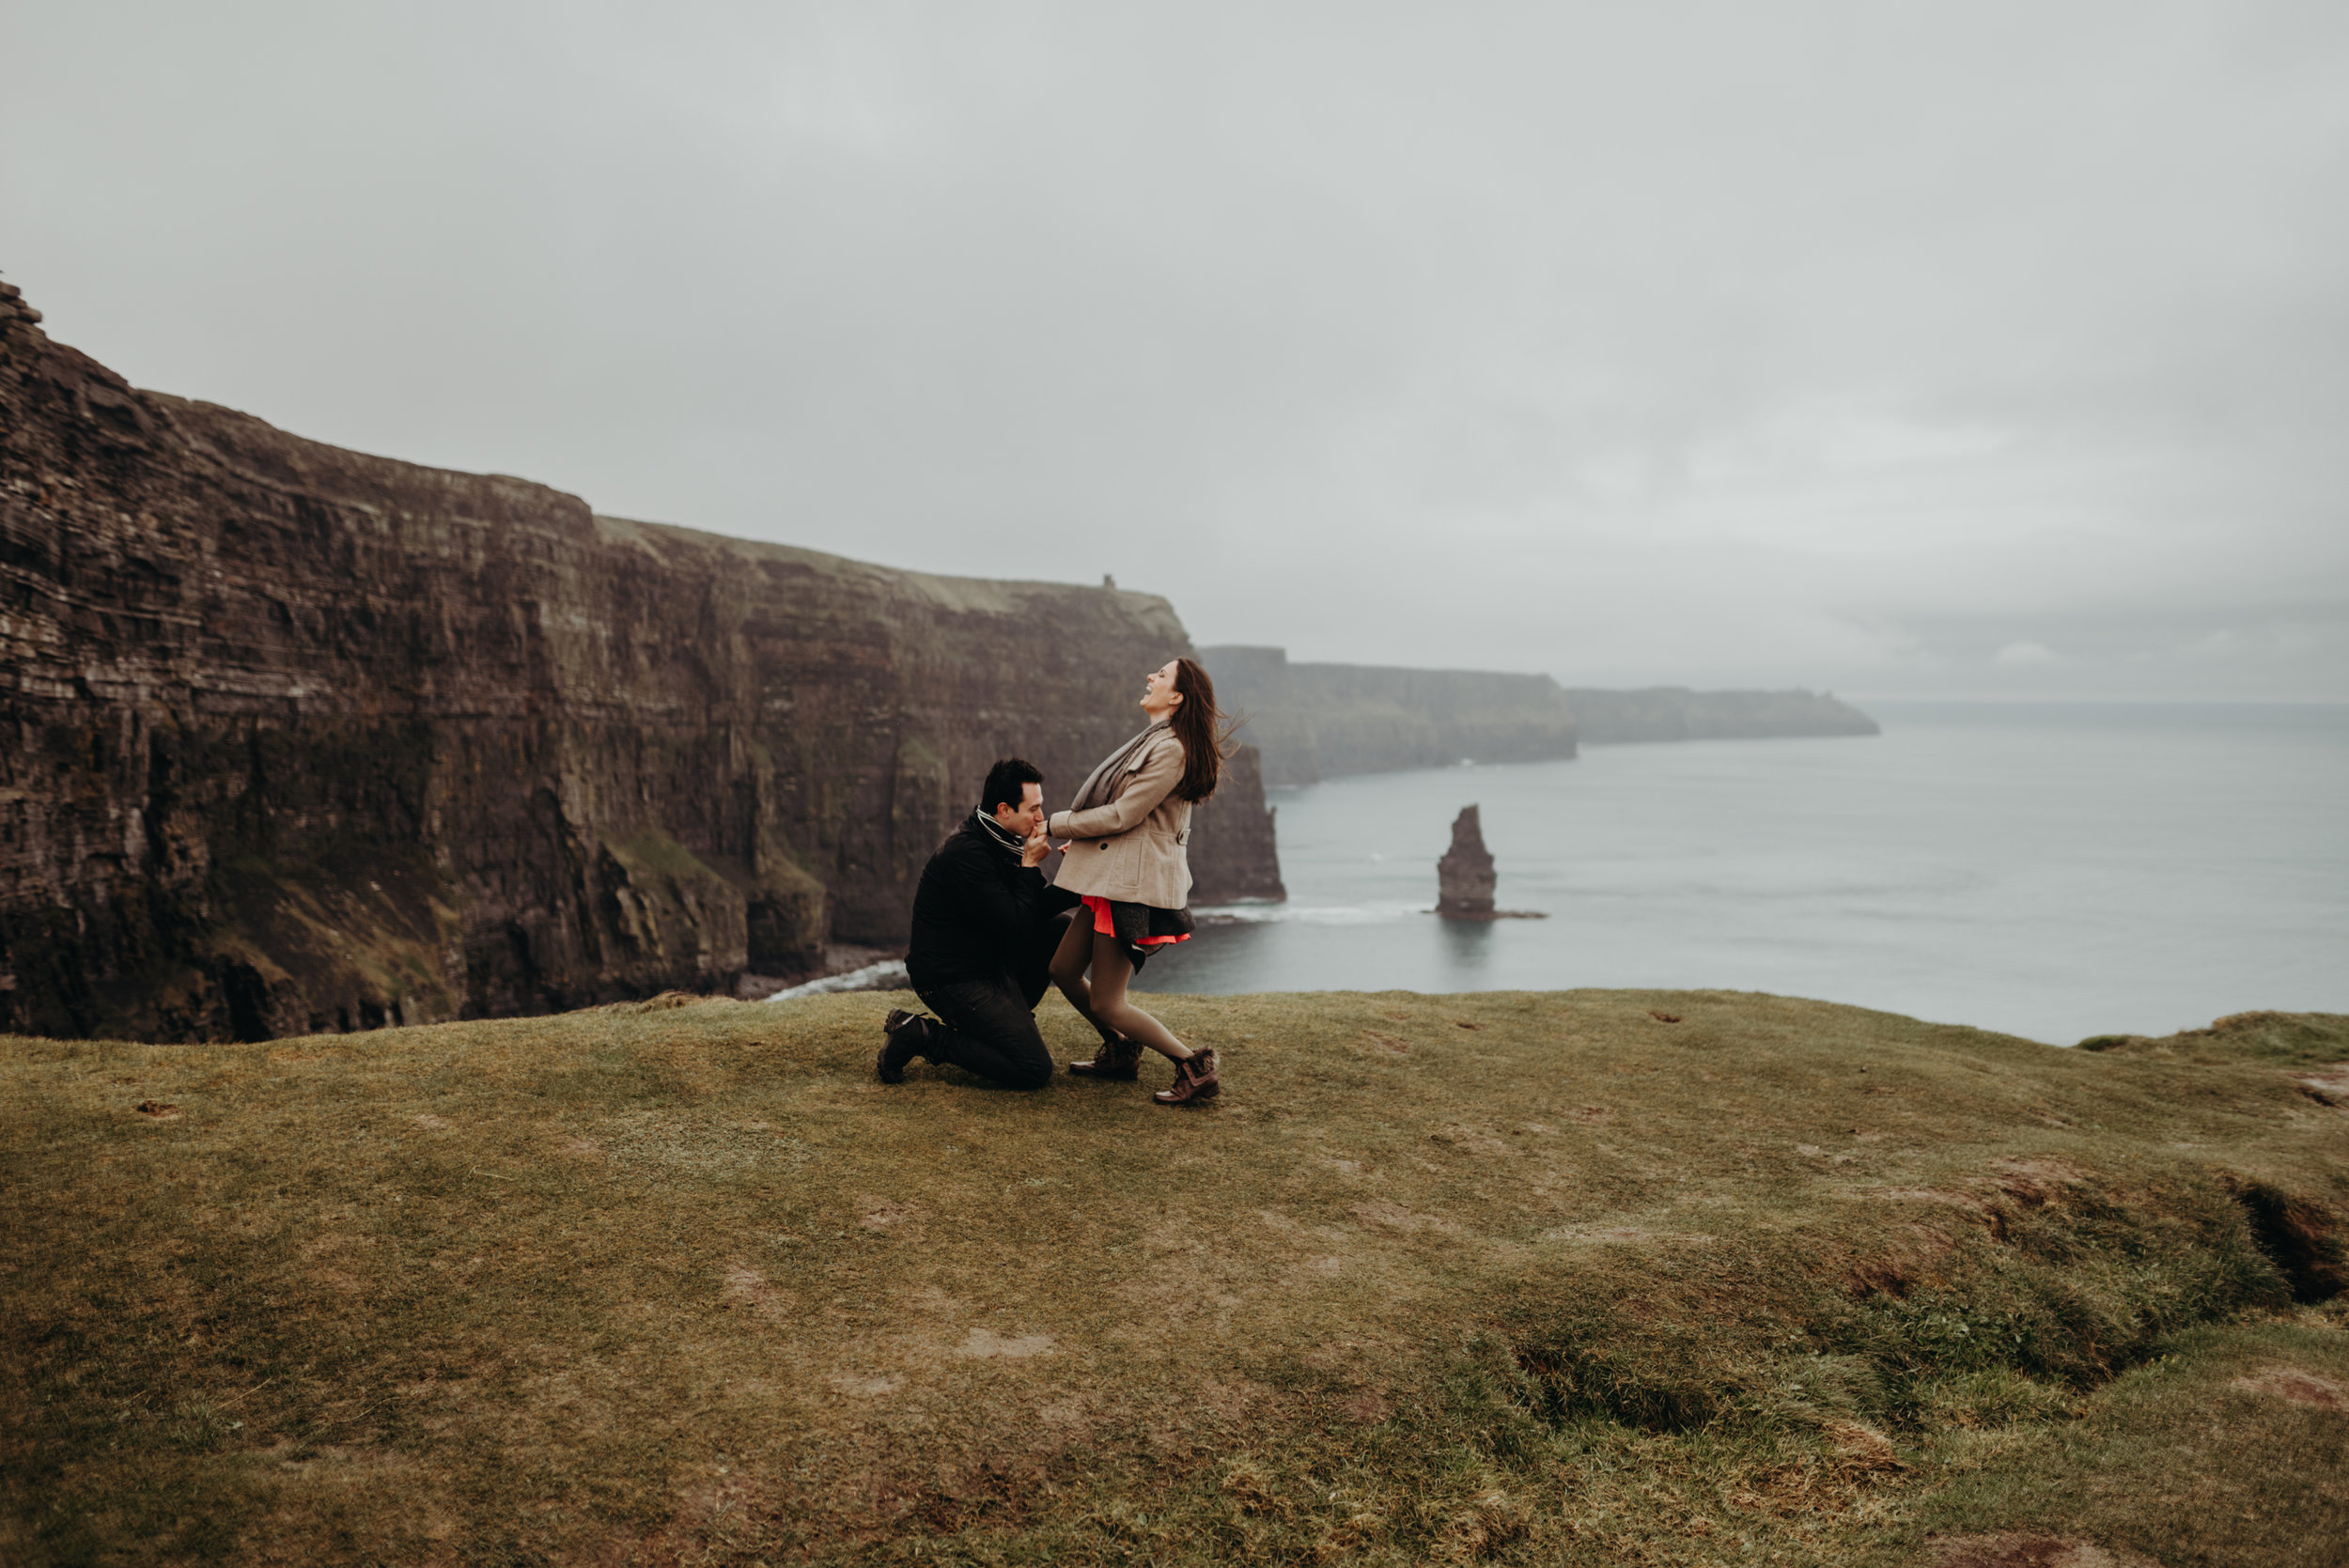 Cliffs Of Moher Engagement Session - Cliffs of Moher Proposal - Cliffs of Mhoer Elopement_5089-Edit-6.jpg